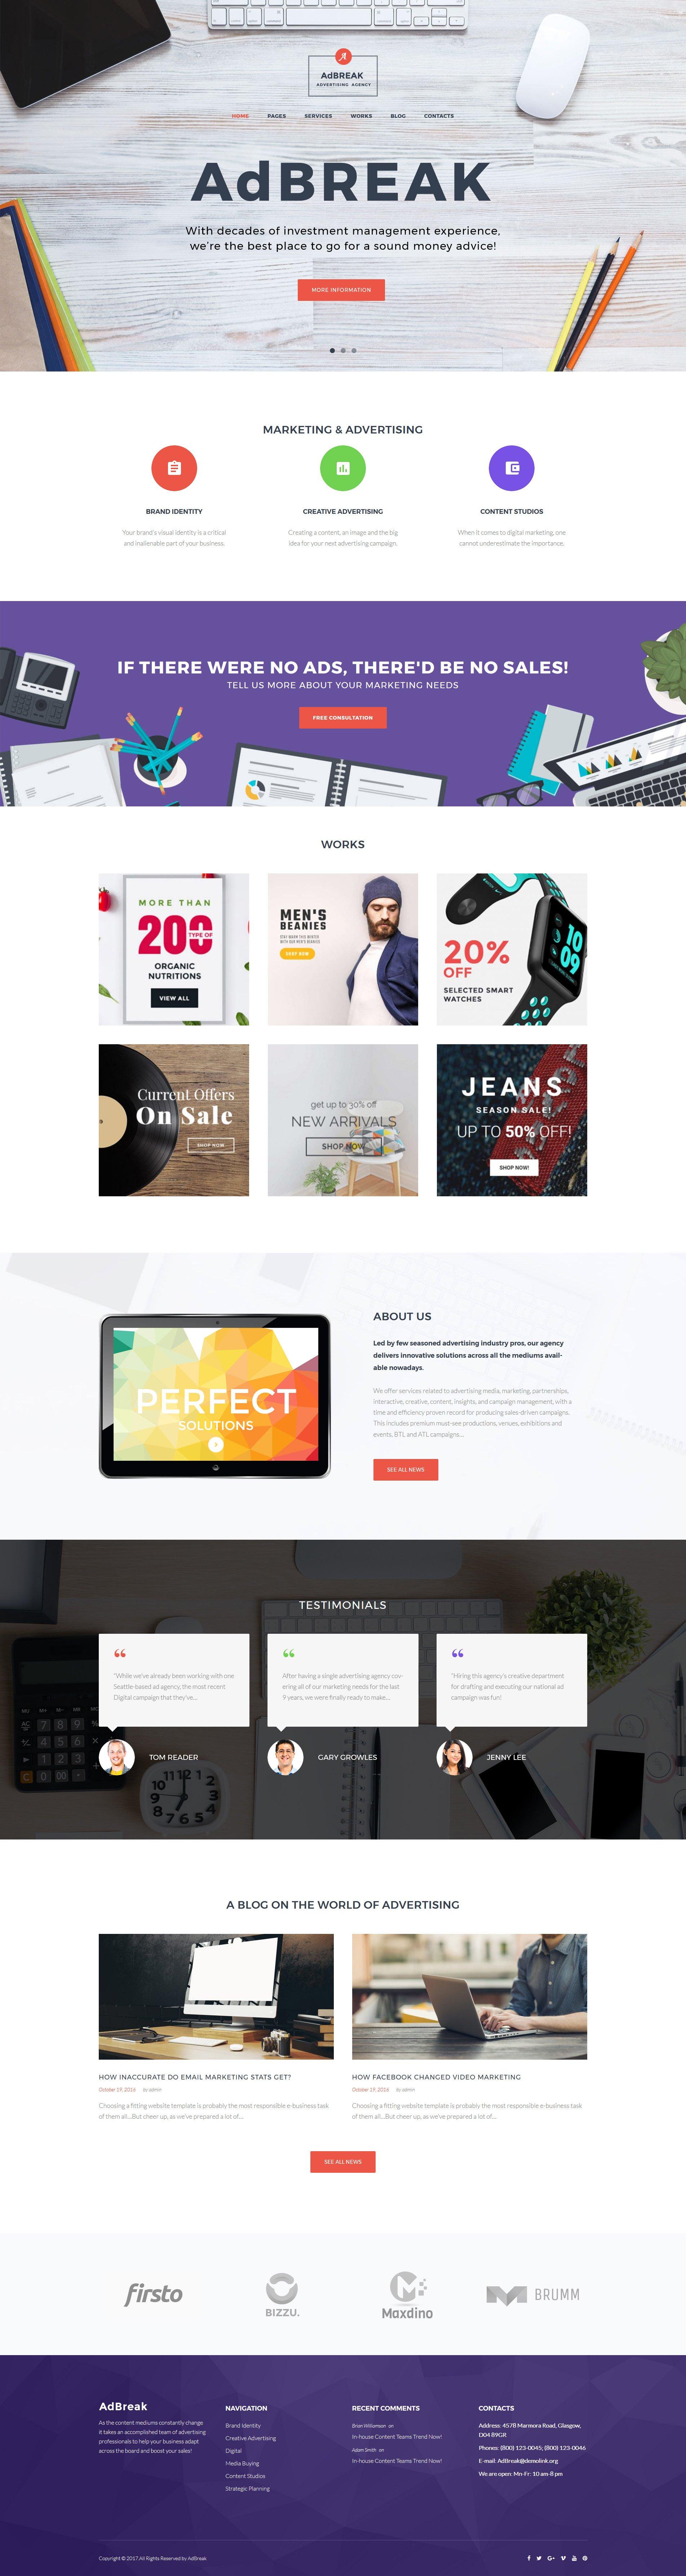 Responsive AdBreak - Advertising Company Wordpress #63502 - Ekran resmi